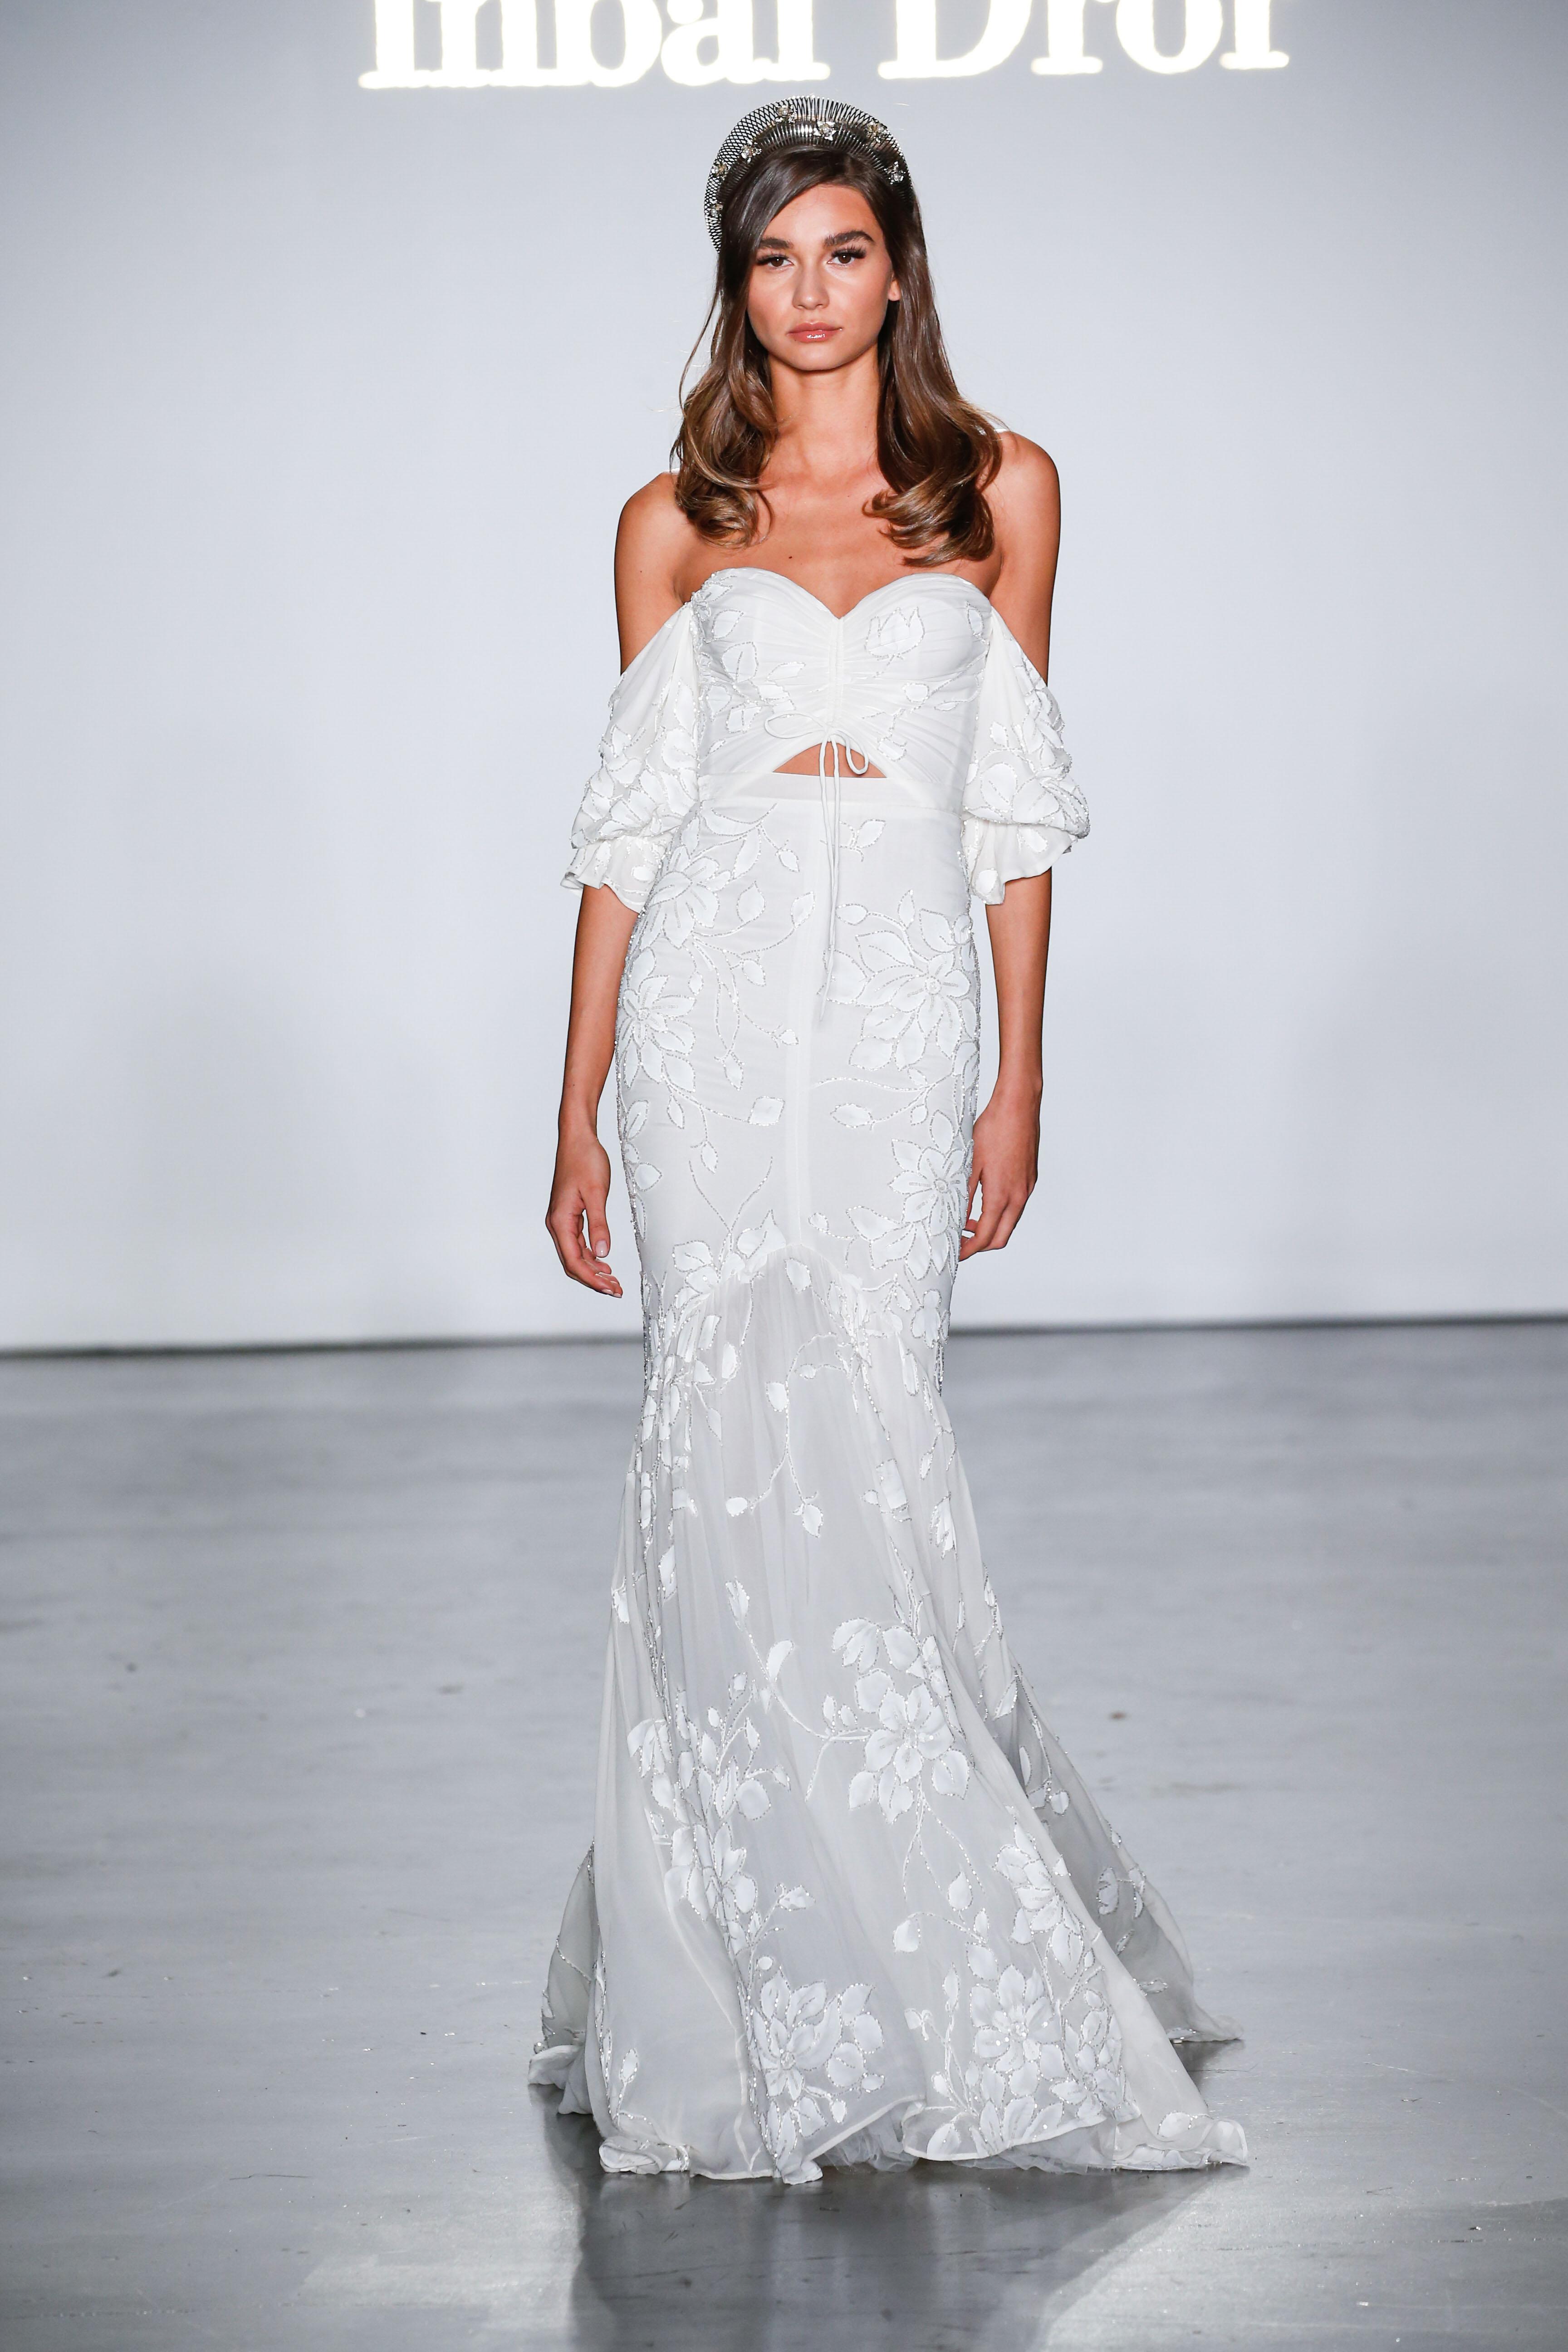 Inbal Dror Bridal Fall 2020